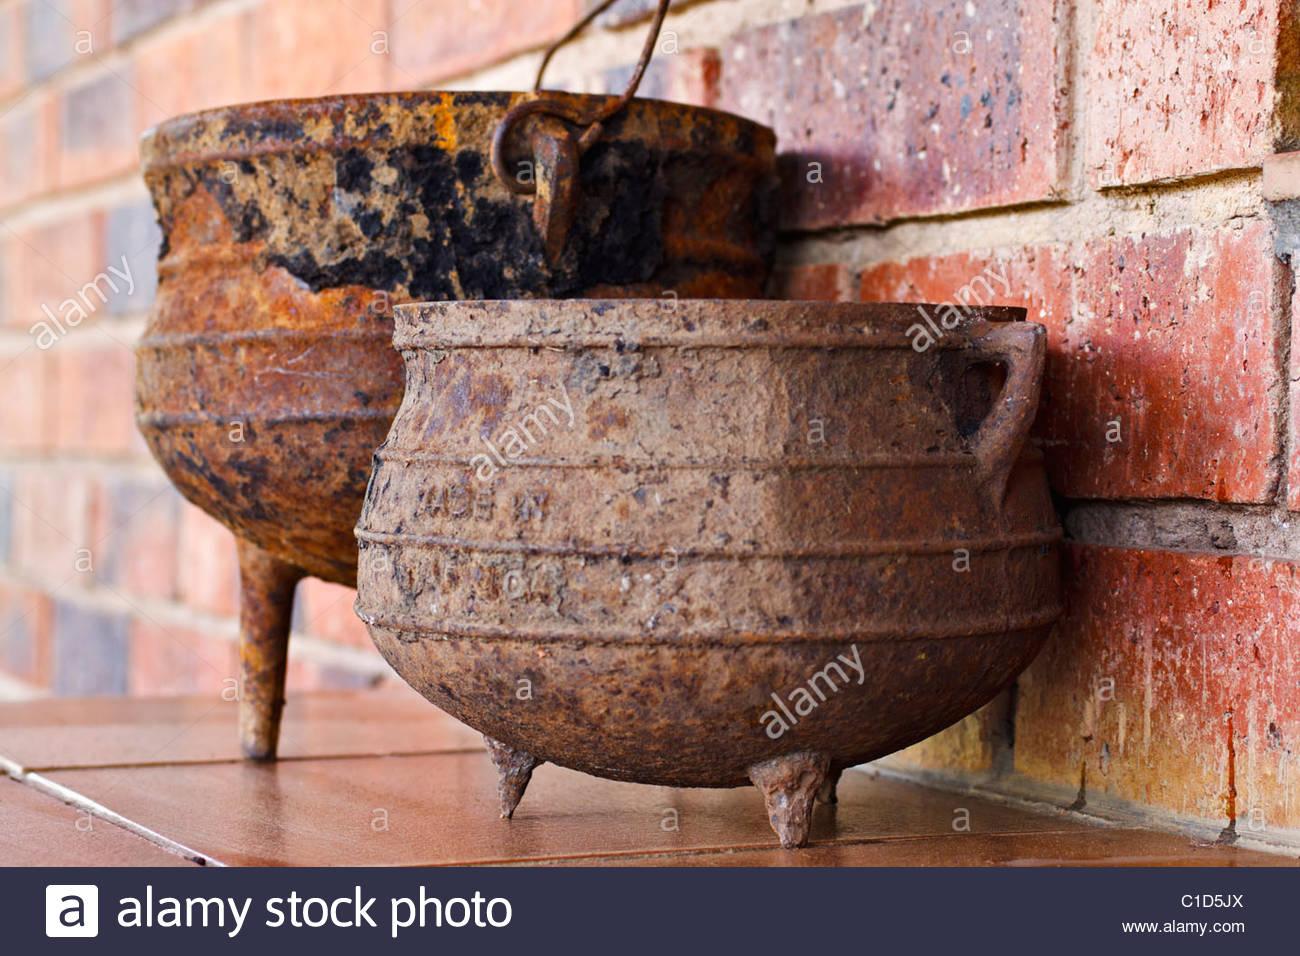 Cast Iron Three Legged Pots.